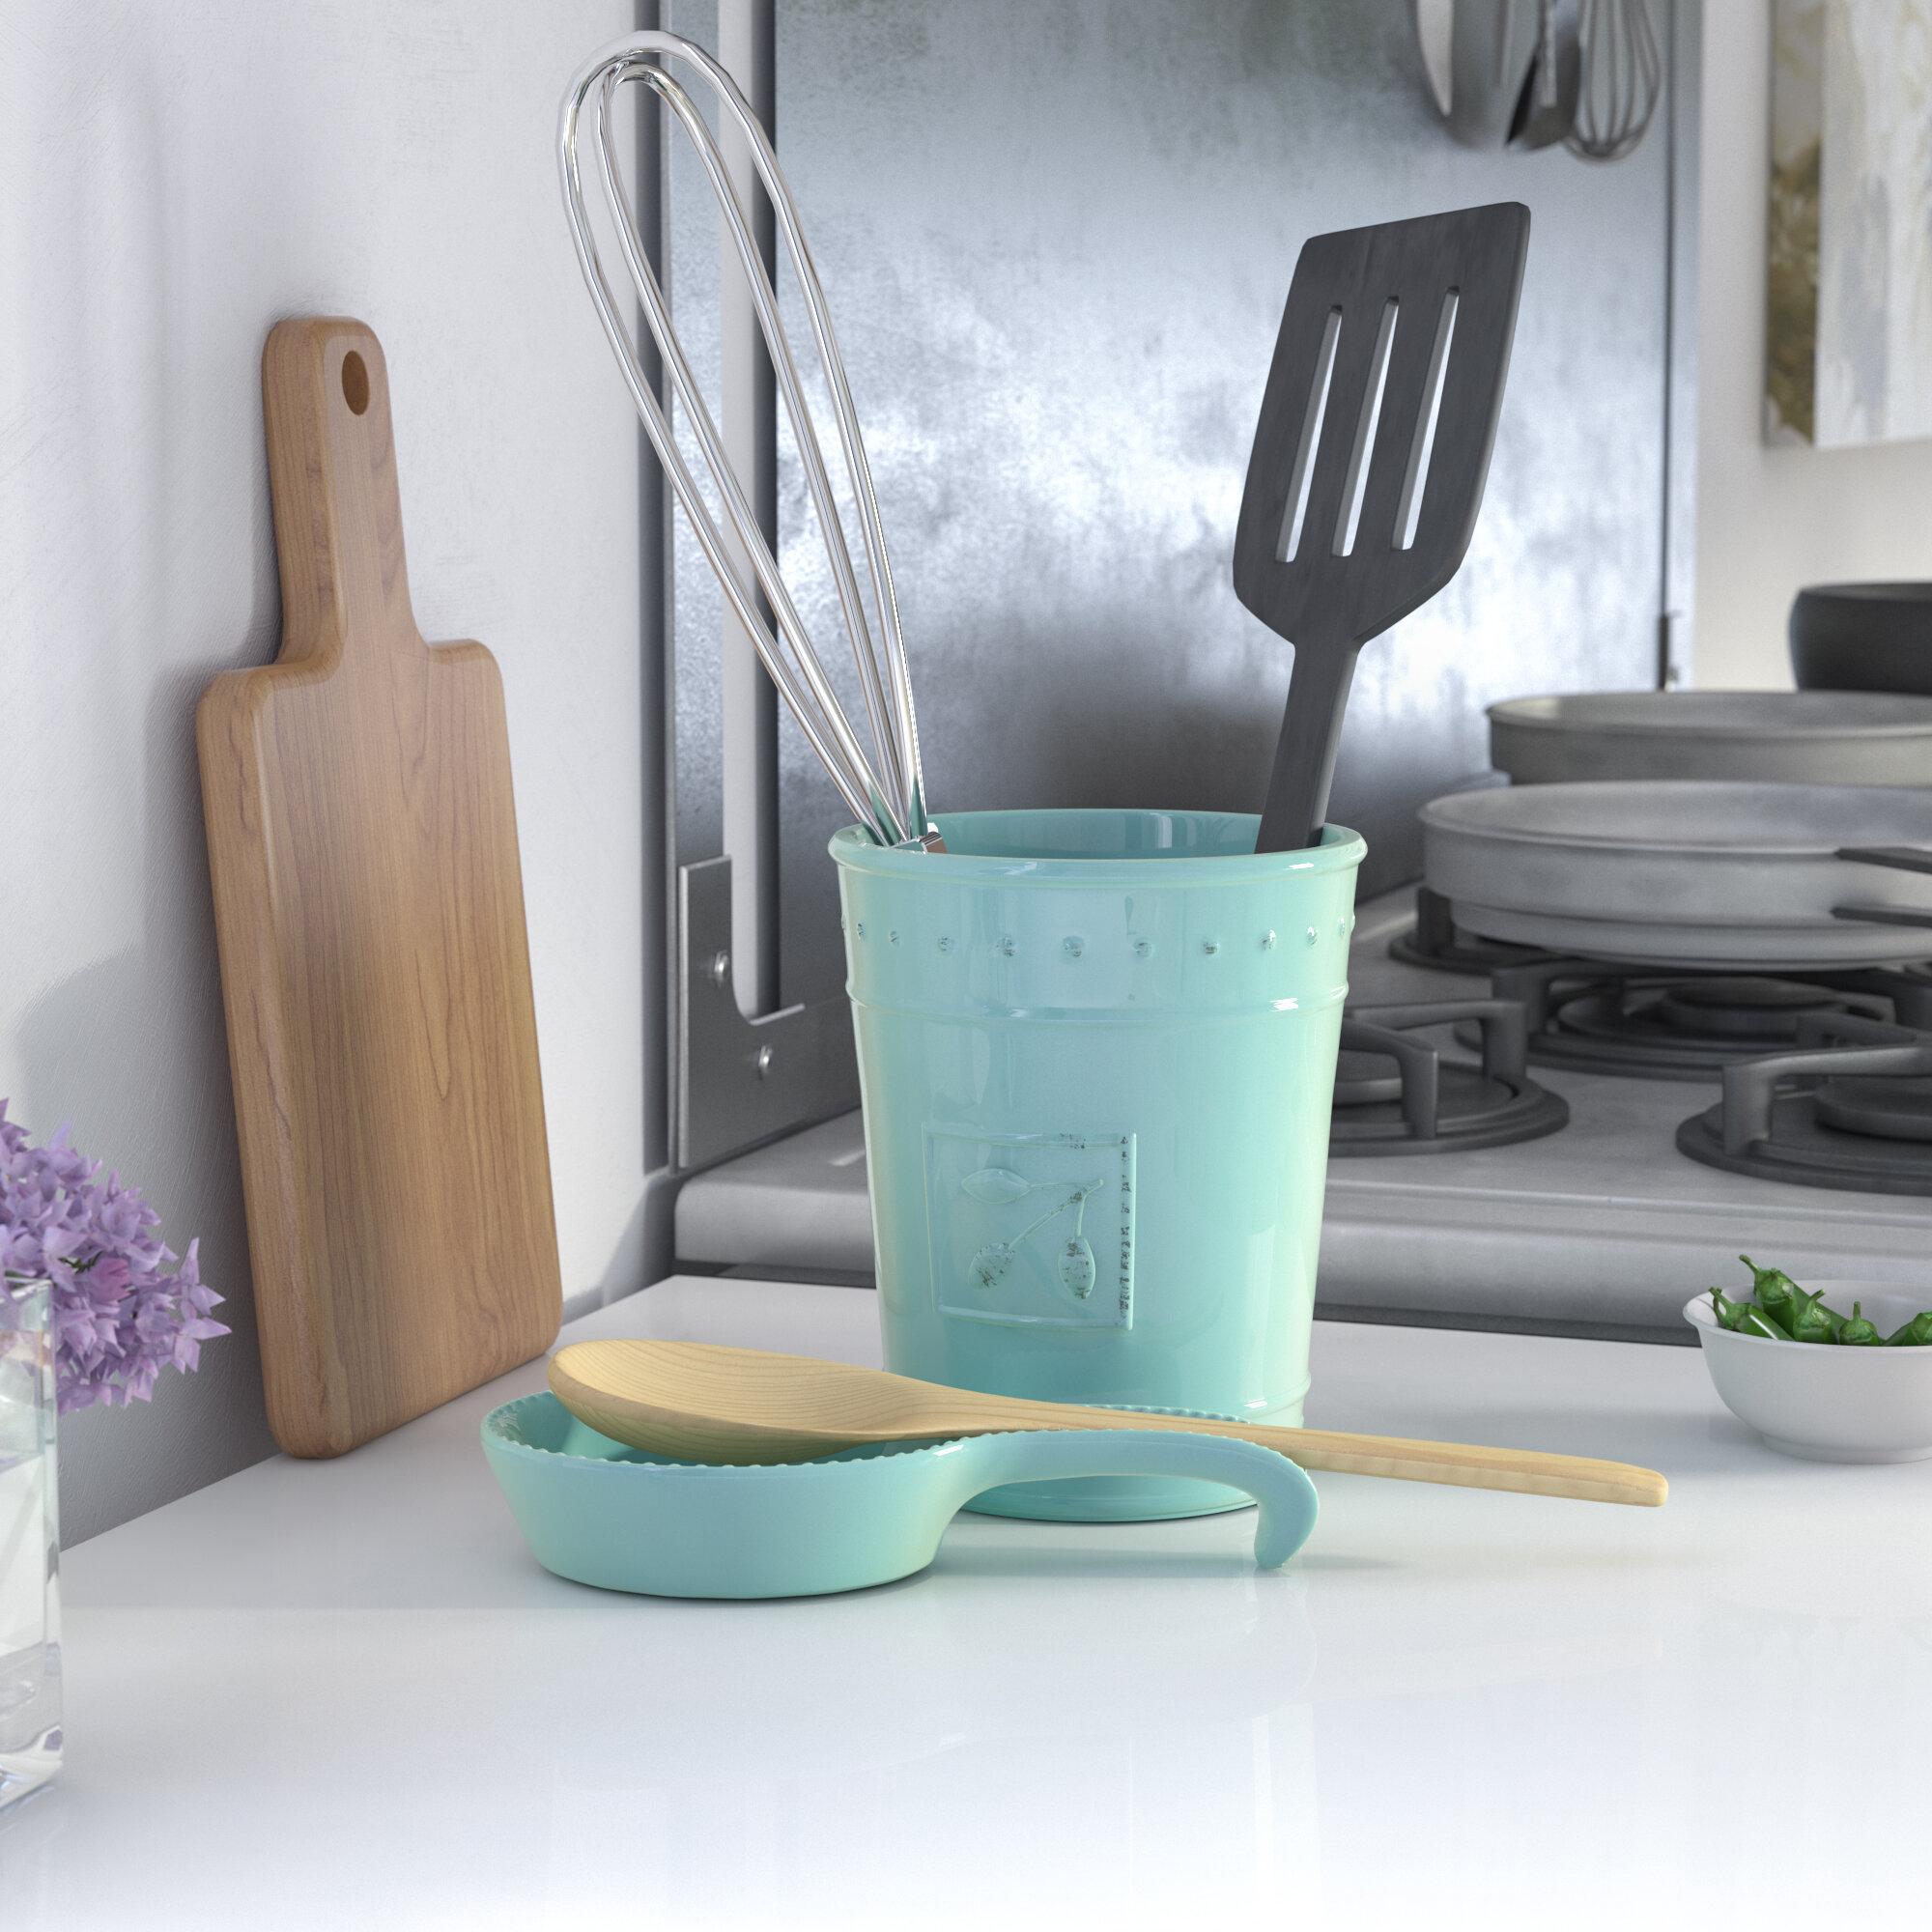 Lark Manor Spoon Rest and Utensil Crock & Reviews | Wayfair